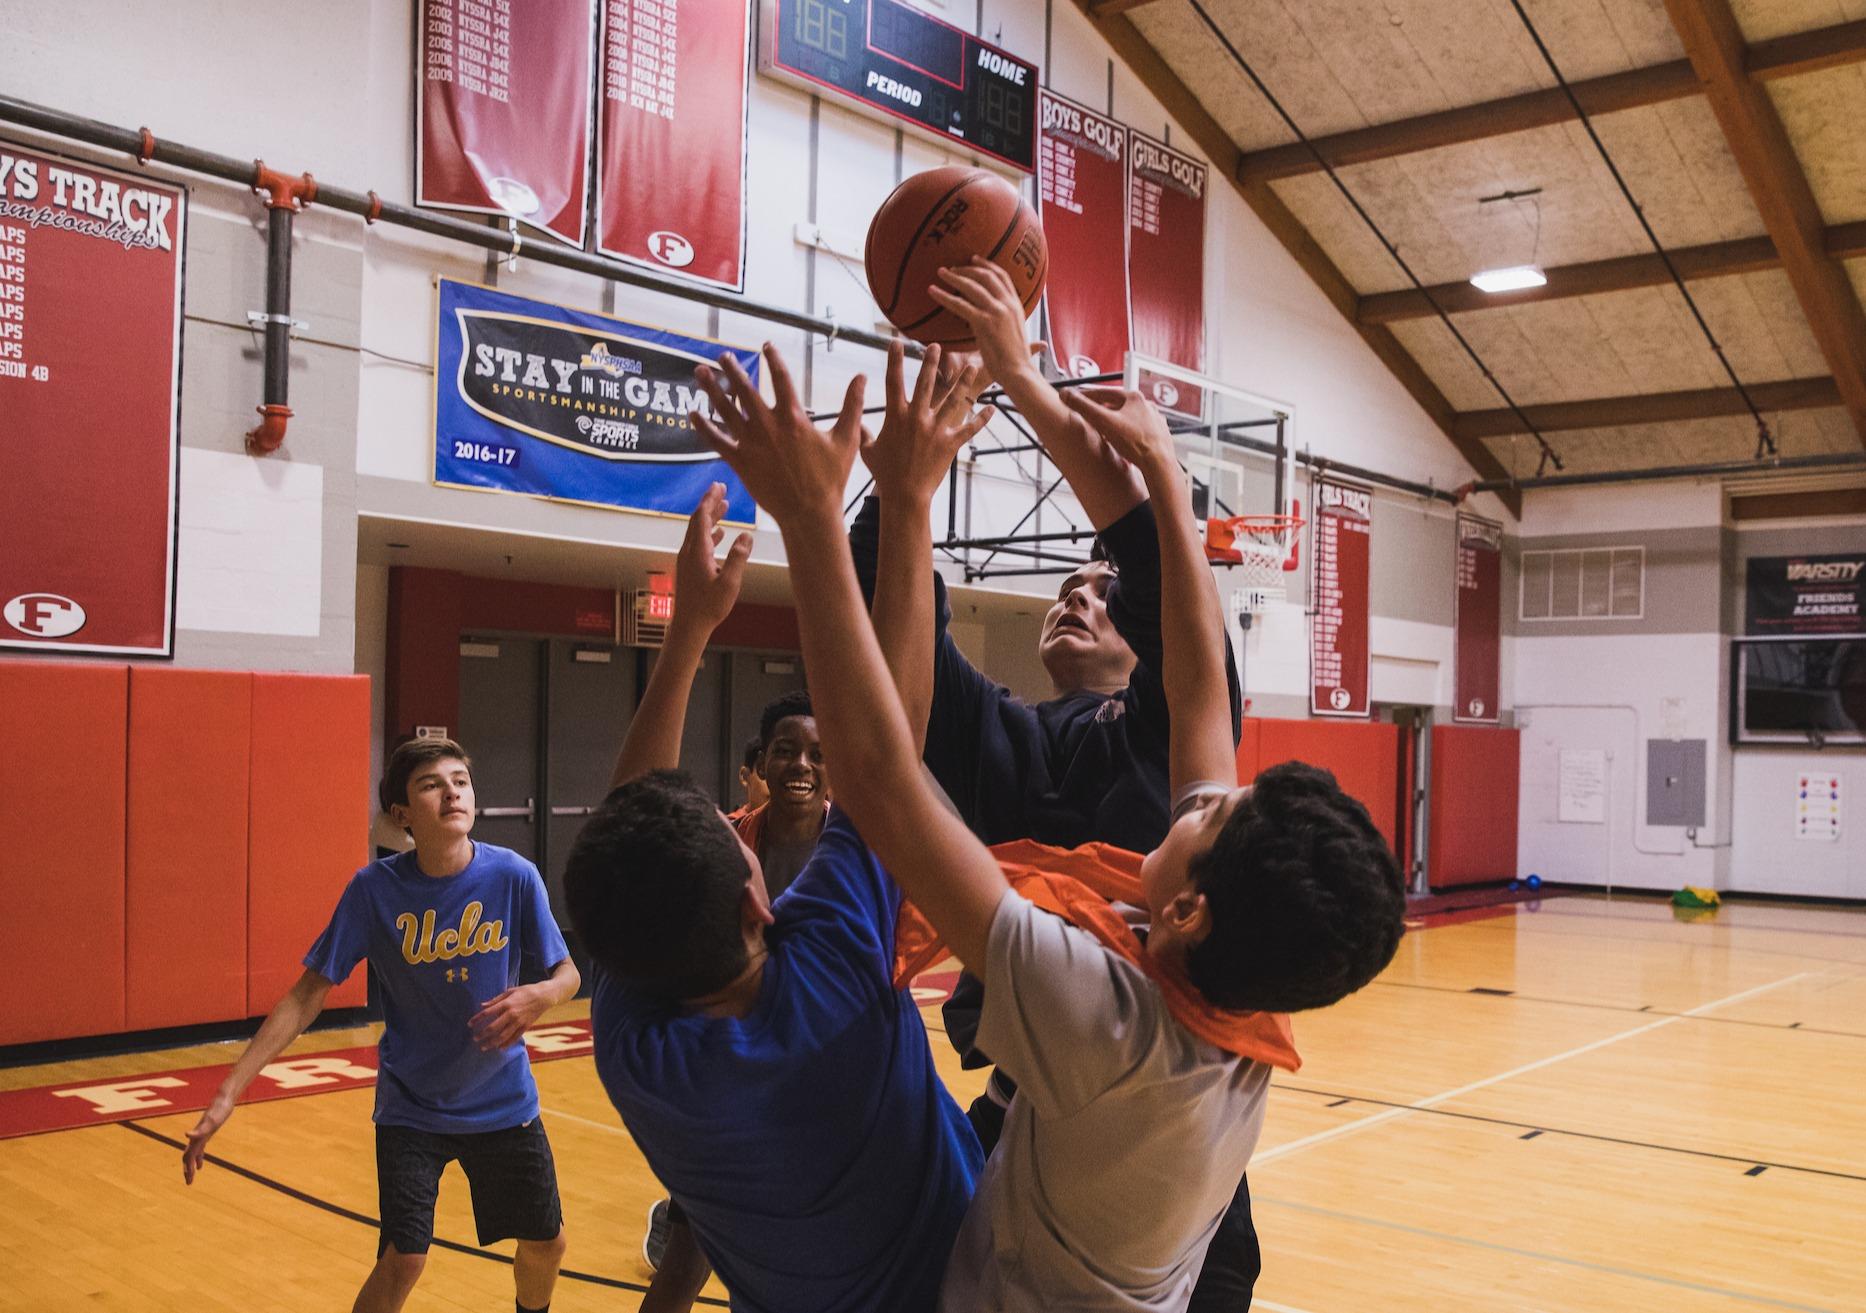 us-students-playing-basketball